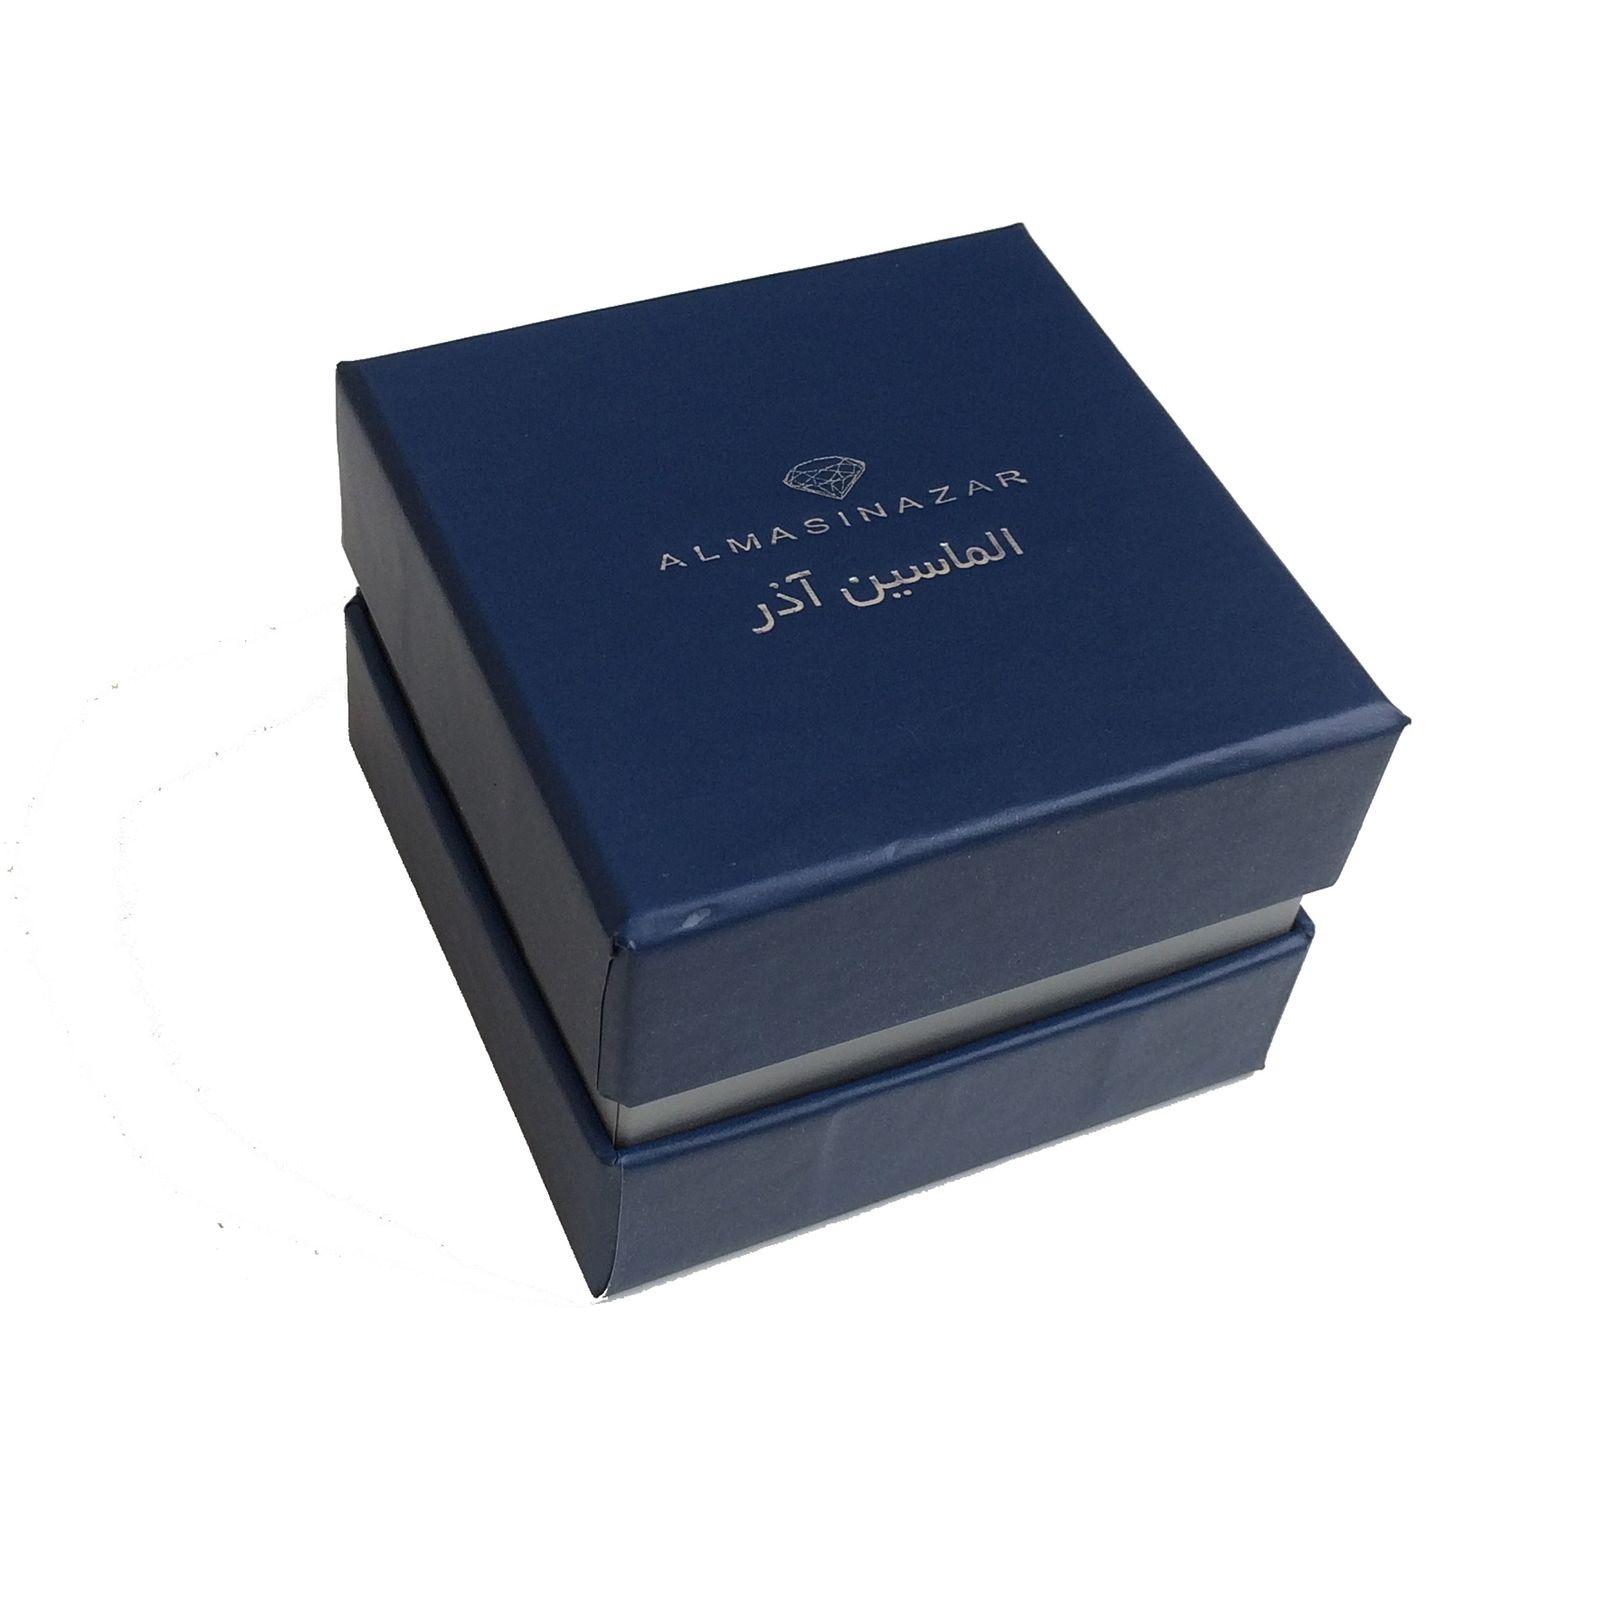 دستبند طلا 18 عیار زنانه الماسین آذر کد ZANBUR01 -  - 5